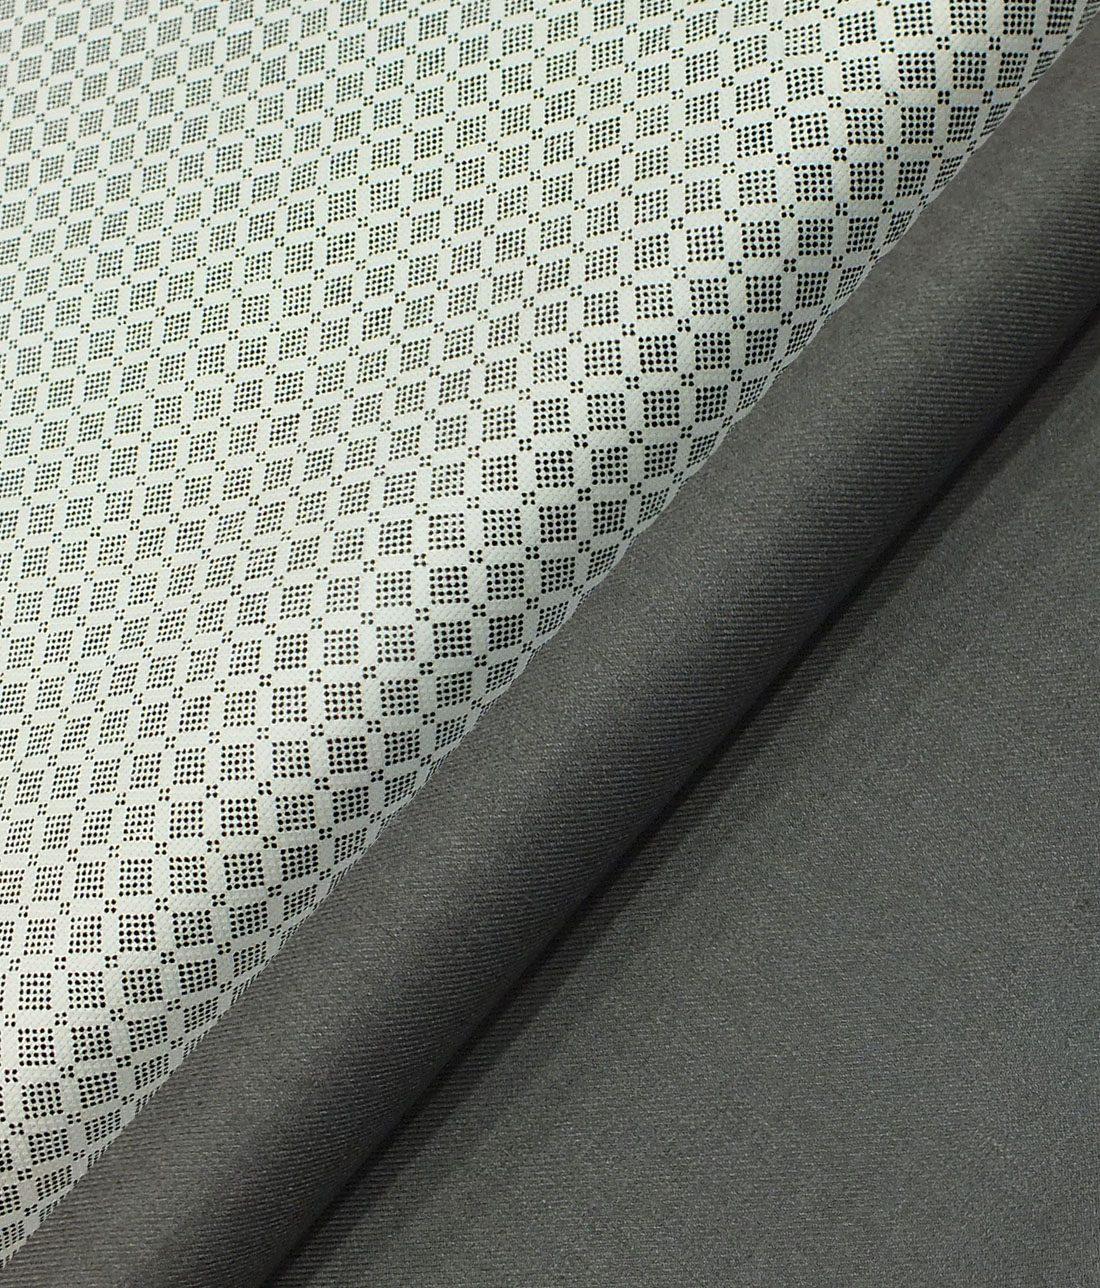 ed2f1ba23 Cotton Shirt Fabric Online - DREAMWORKS